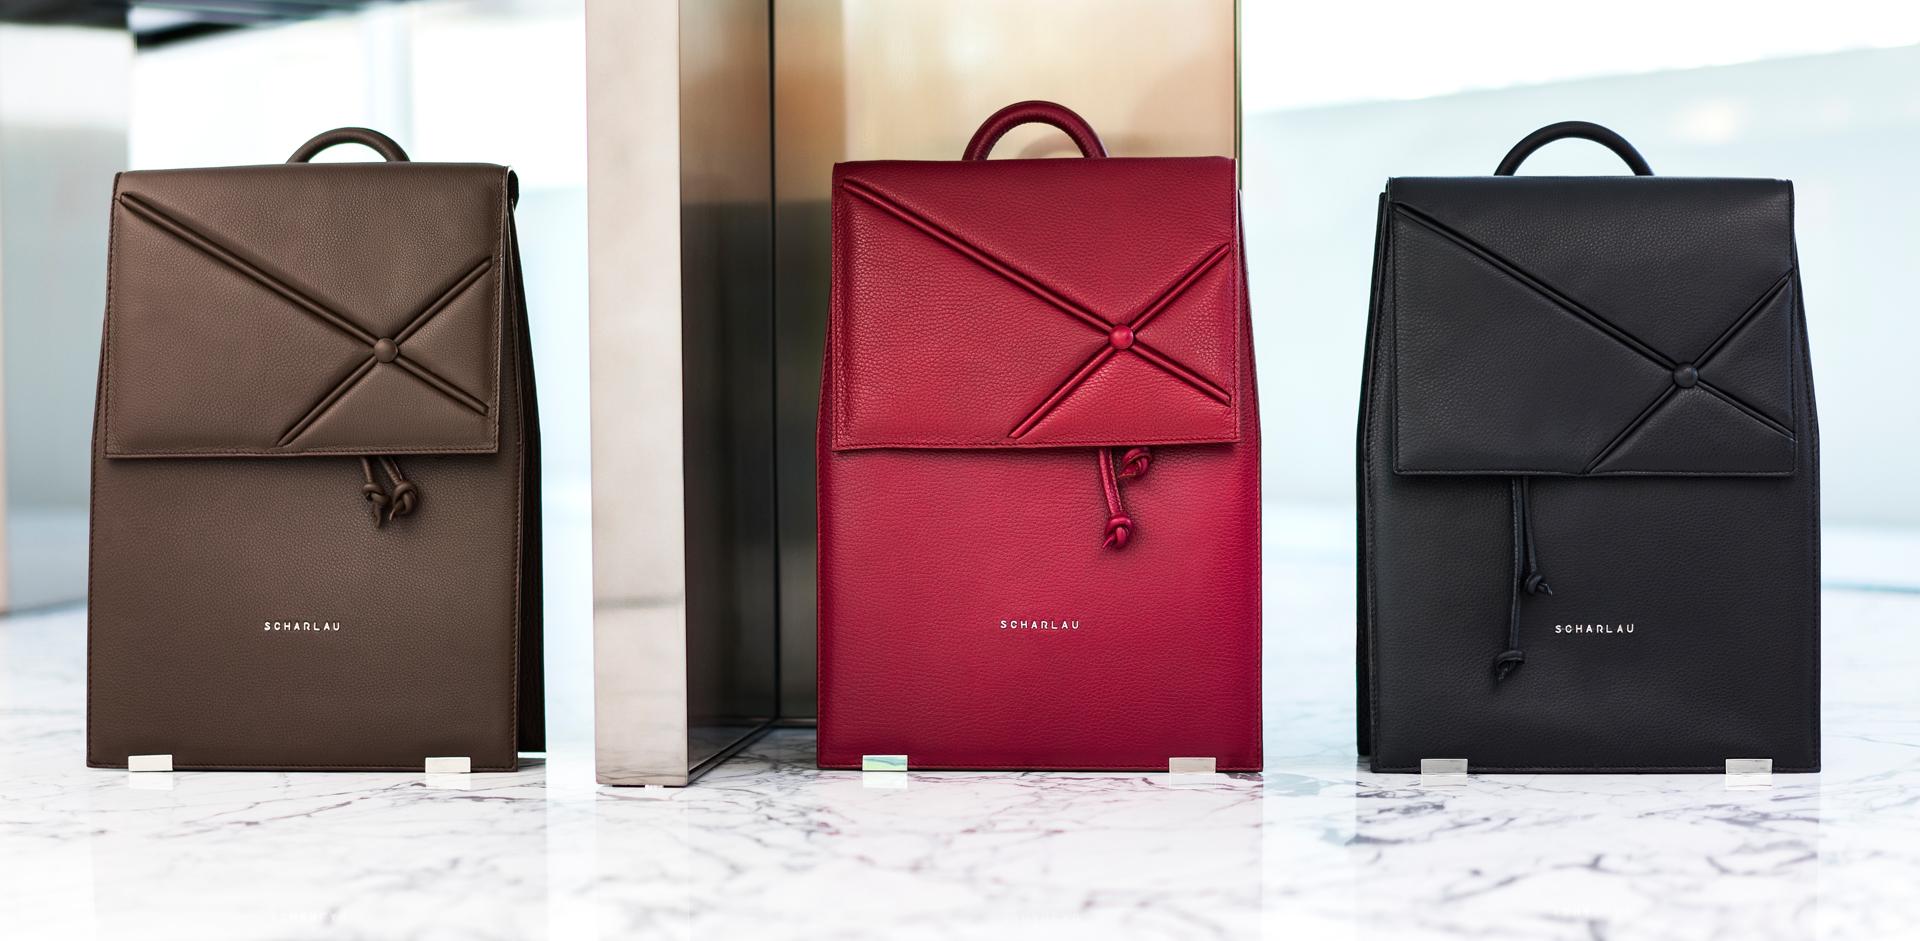 Scharlau-Mies-mochilas-mujer-piel-home-LuxurySpain